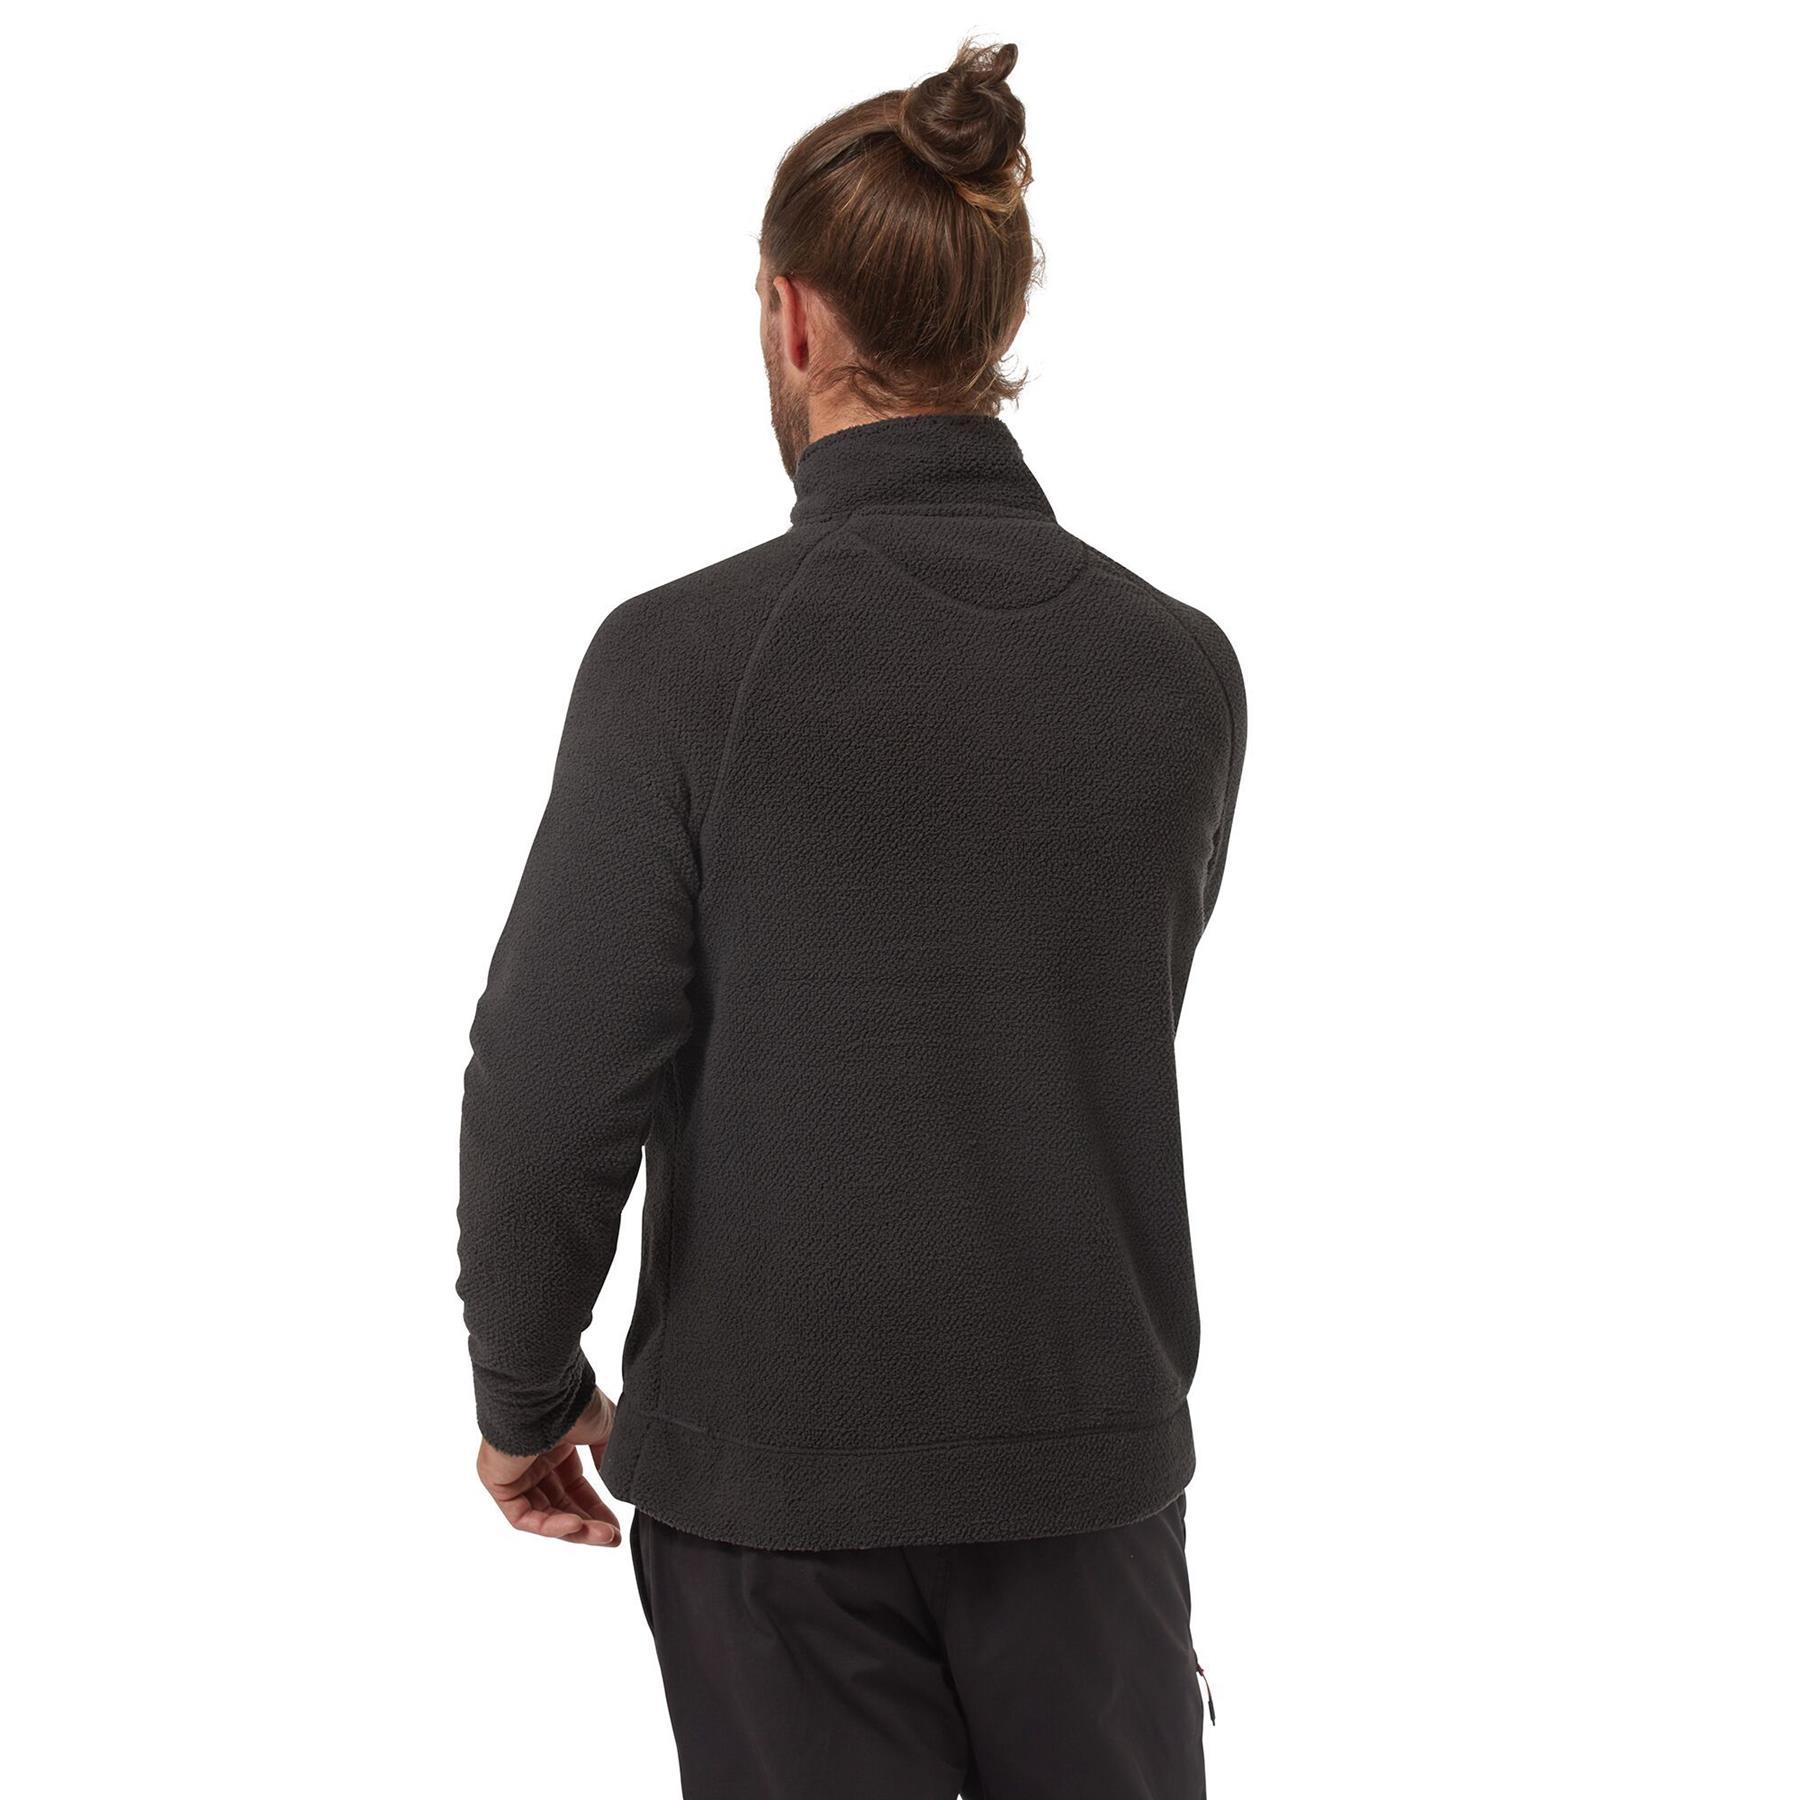 miniatuur 7 - Craghopper Mens Cason Fleece Half Zip Bobble Soft Jumper Pullover Sweater